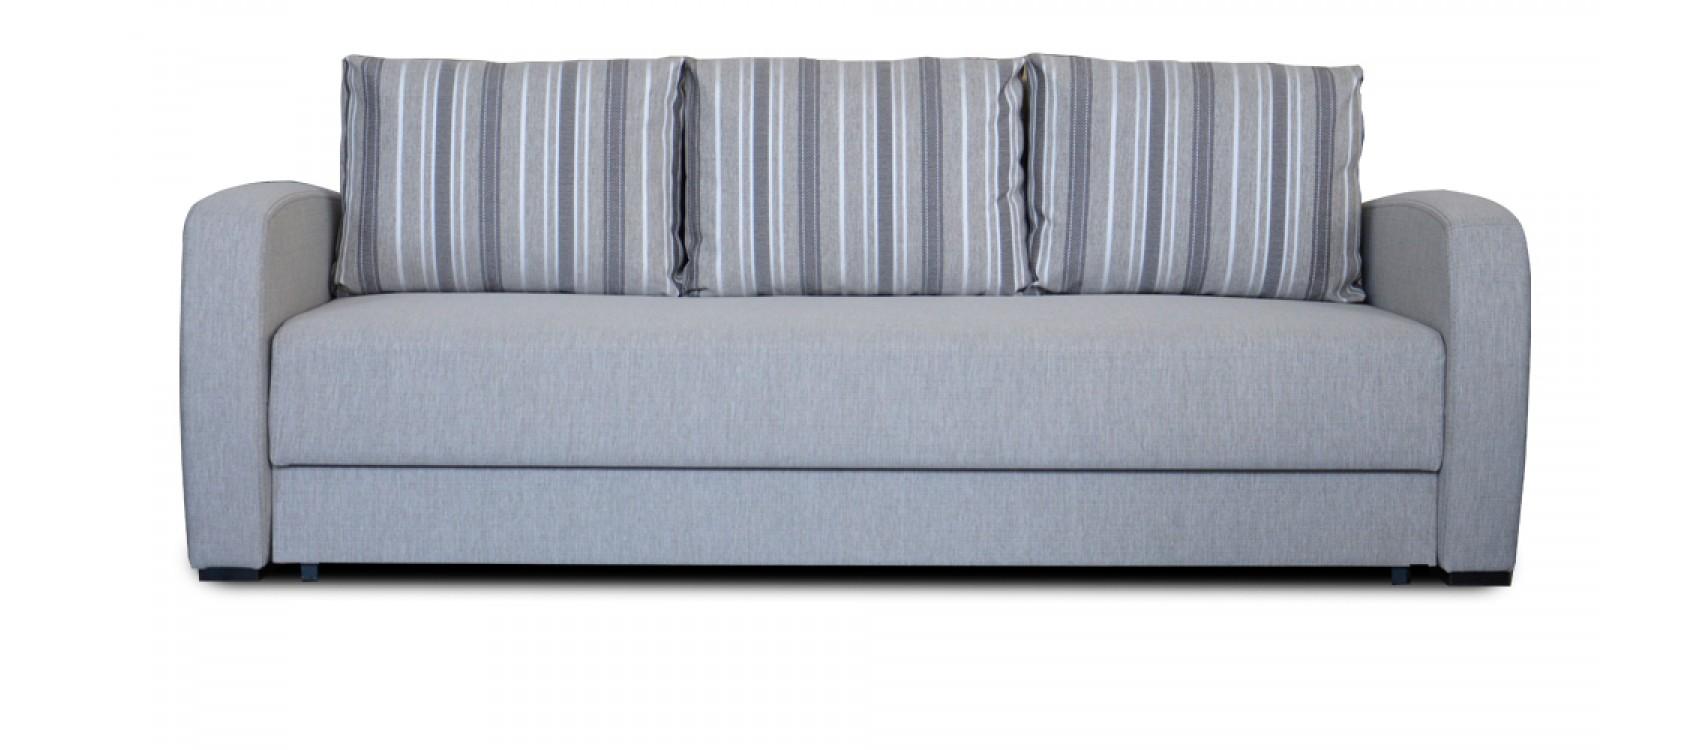 Sofa GOLF foto 5